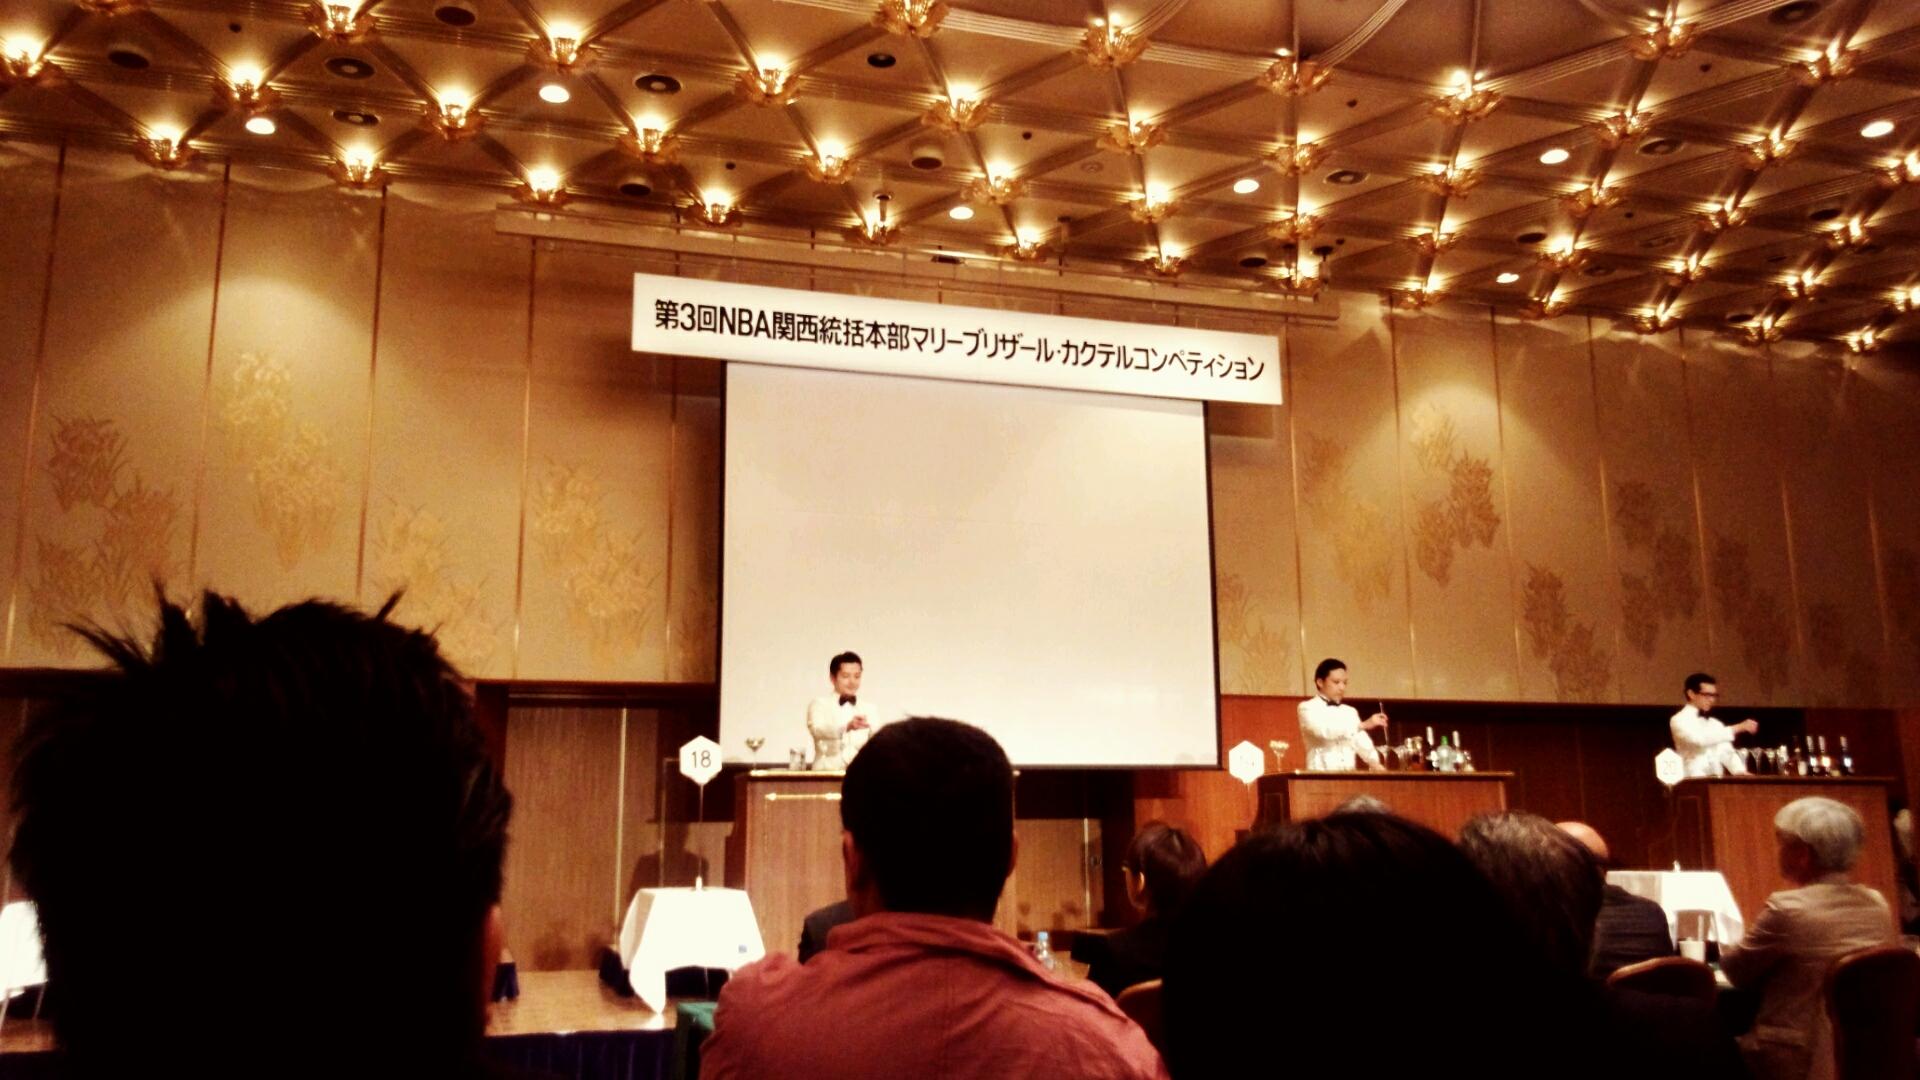 C360_2012-07-08-13-22-36.jpg